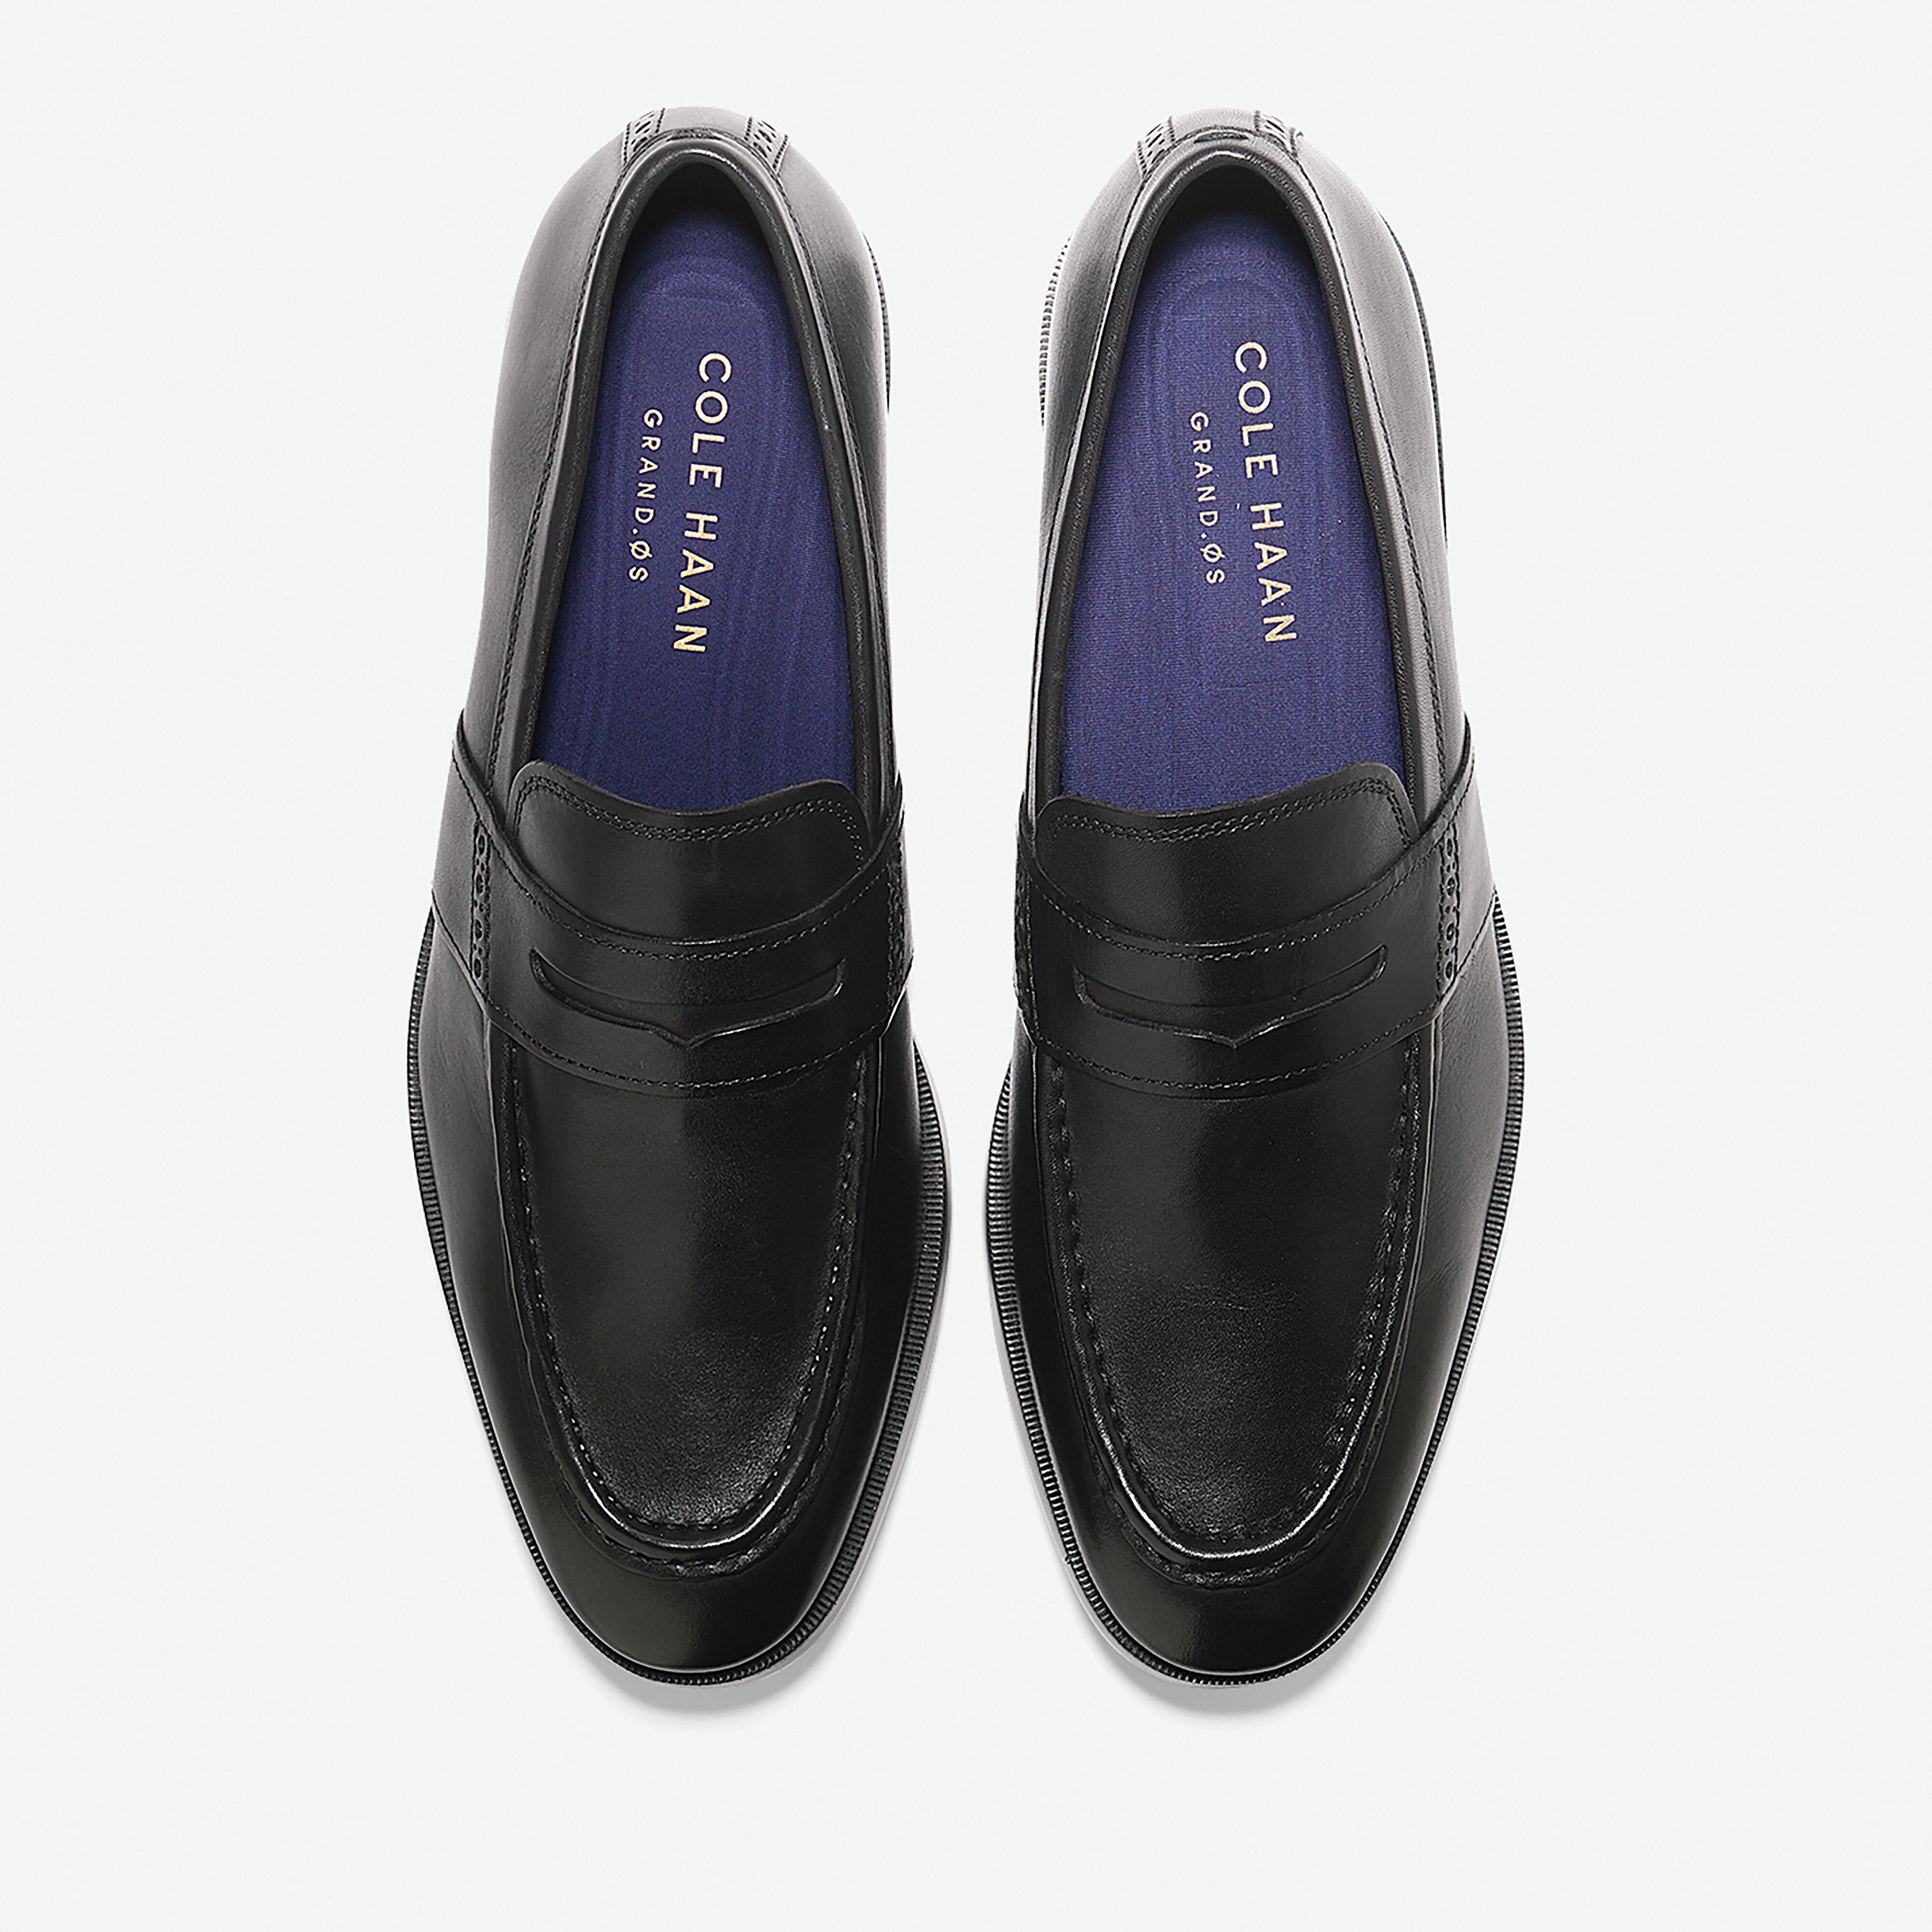 Jefferson Grand Penny Loafer in Black